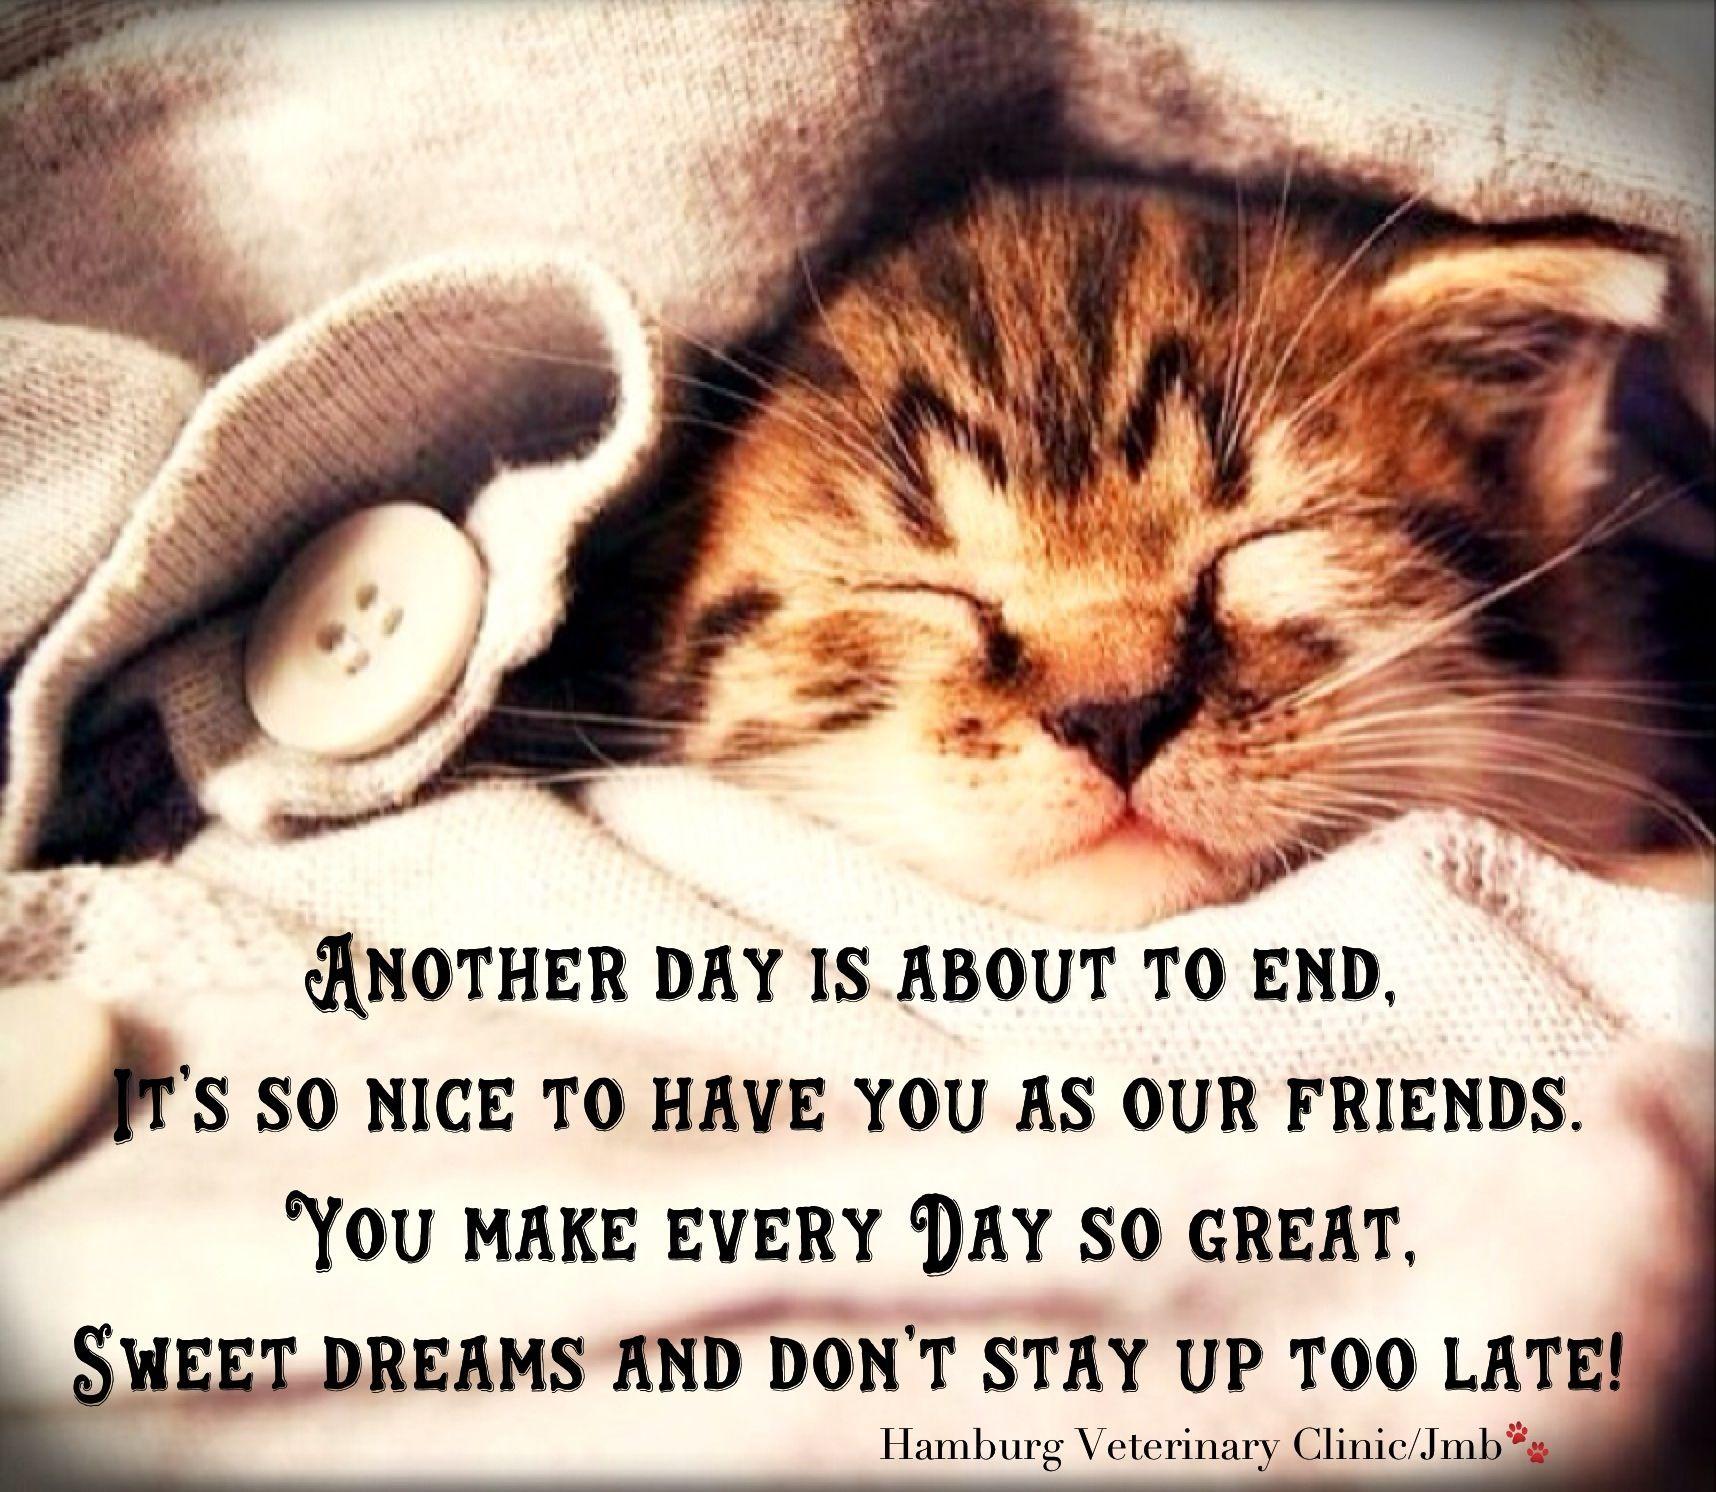 Cute Kitten Good Night Sleep Tight Wishing You The Sweetest Of Dreams Kittens Cutest Cute Animals Animals